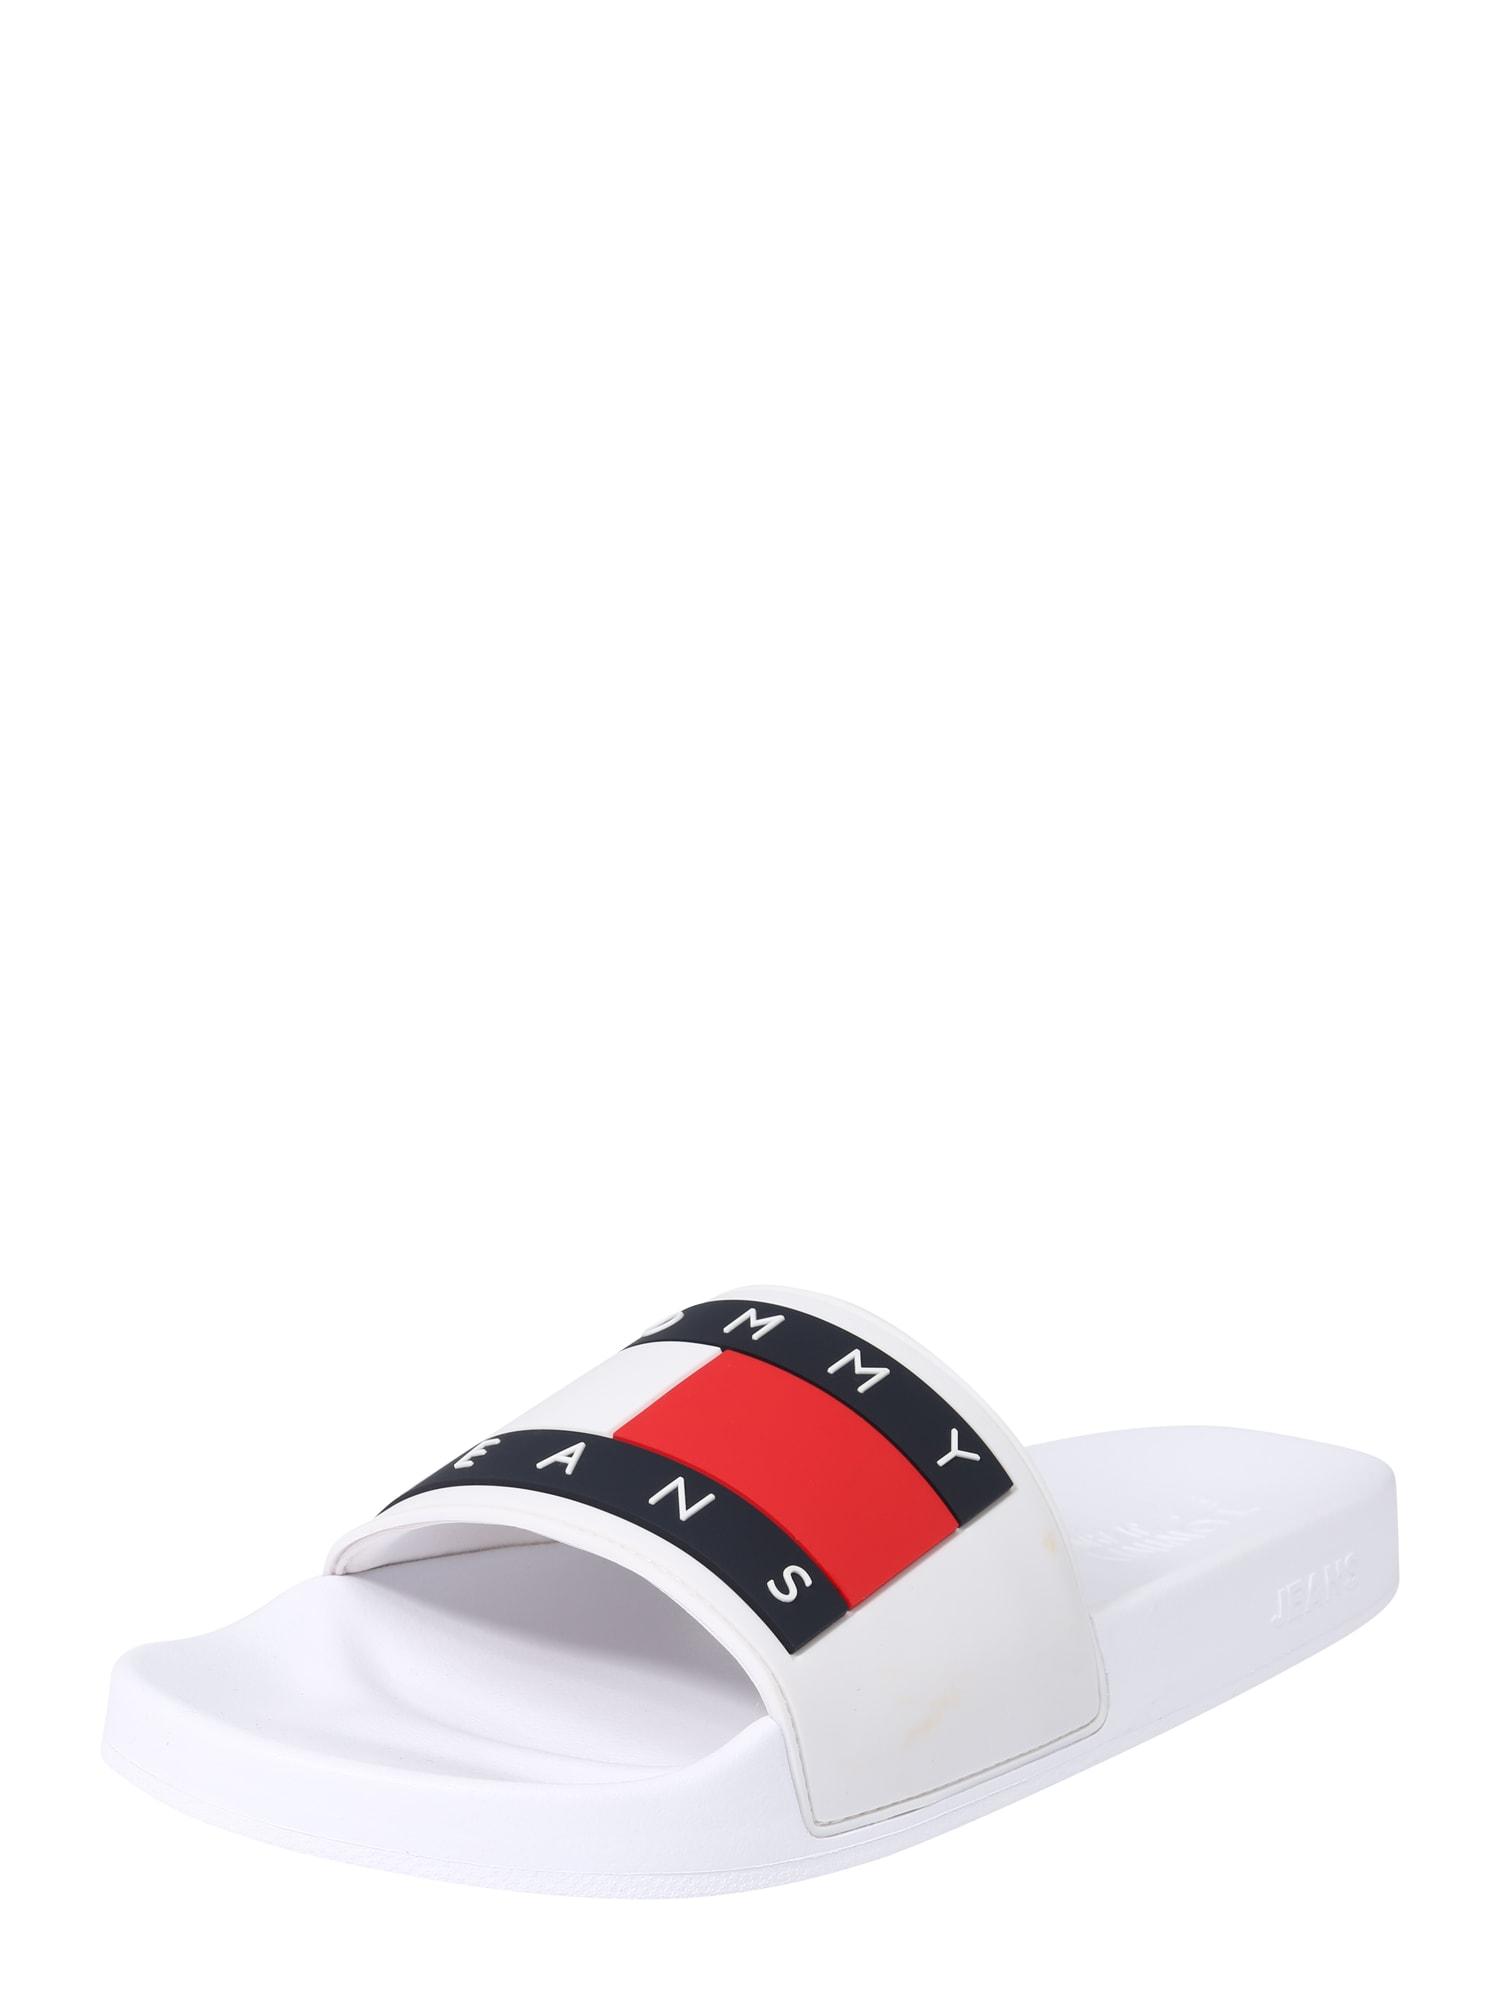 Pantofle AQUA 4 modrá červená bílá Tommy Jeans